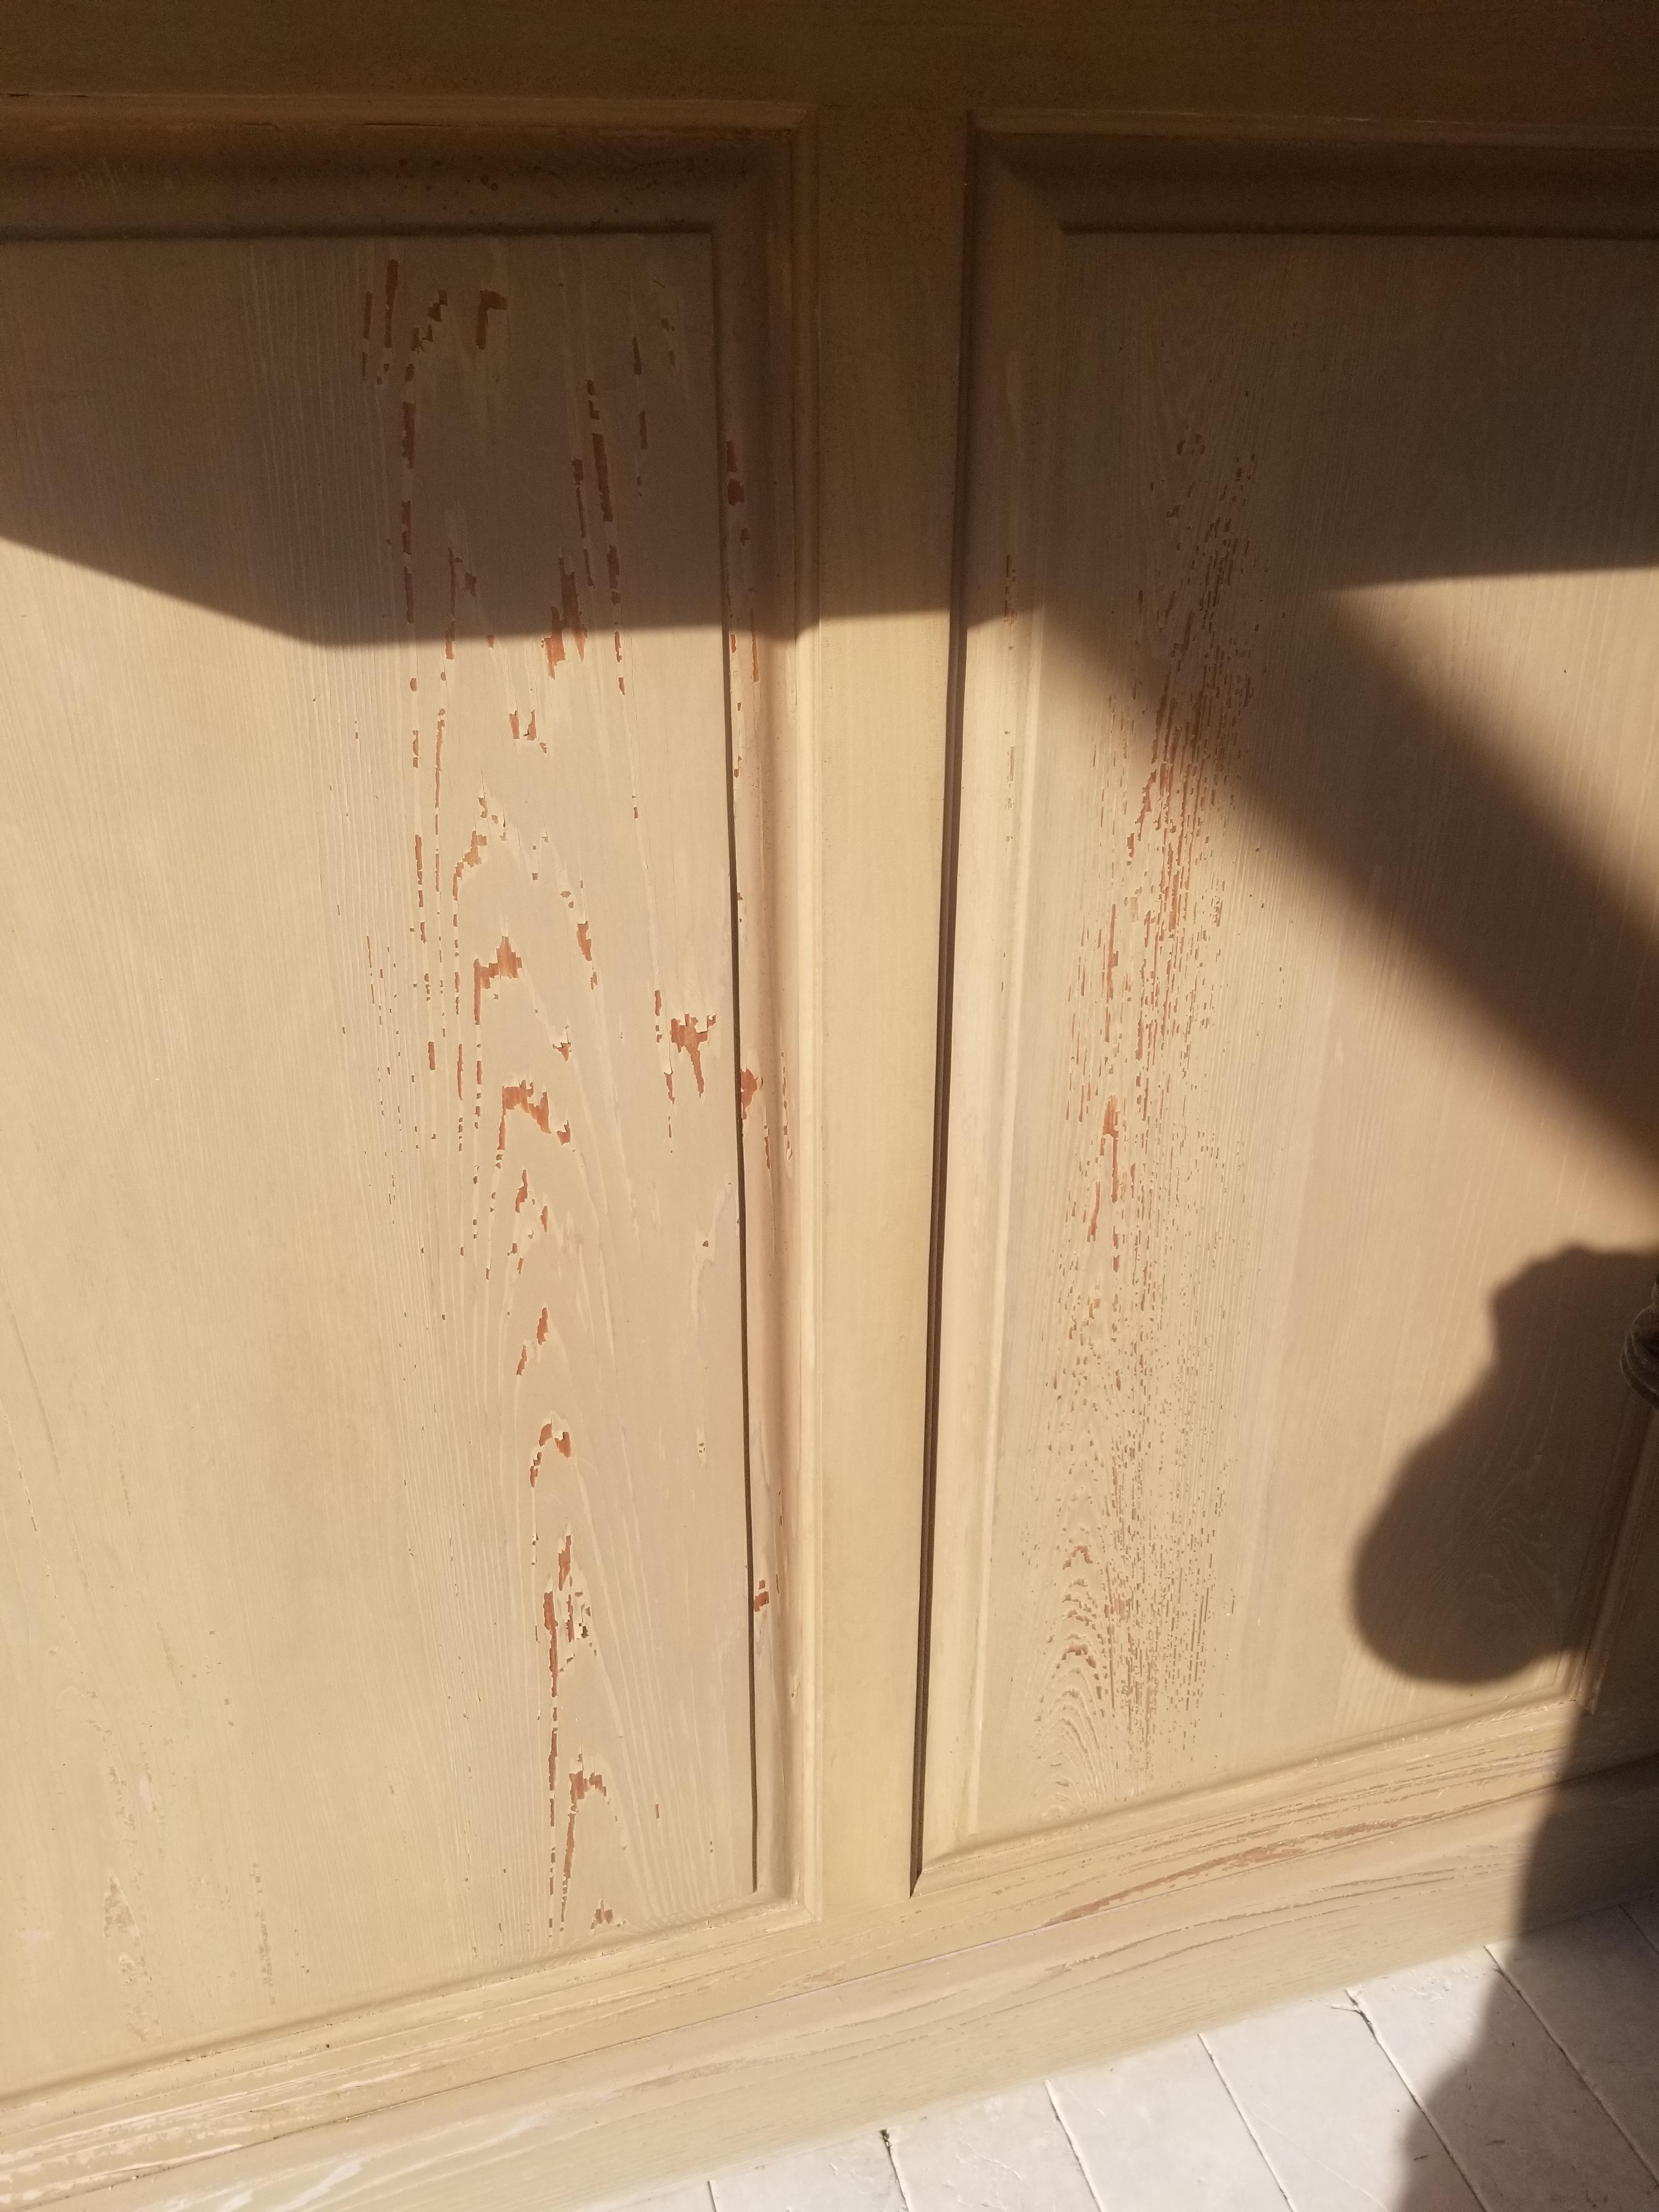 Painting Summer Kitchen Cabinets Summer Kitchen Wood Kitchen Cabinets Painting Kitchen Cabinets